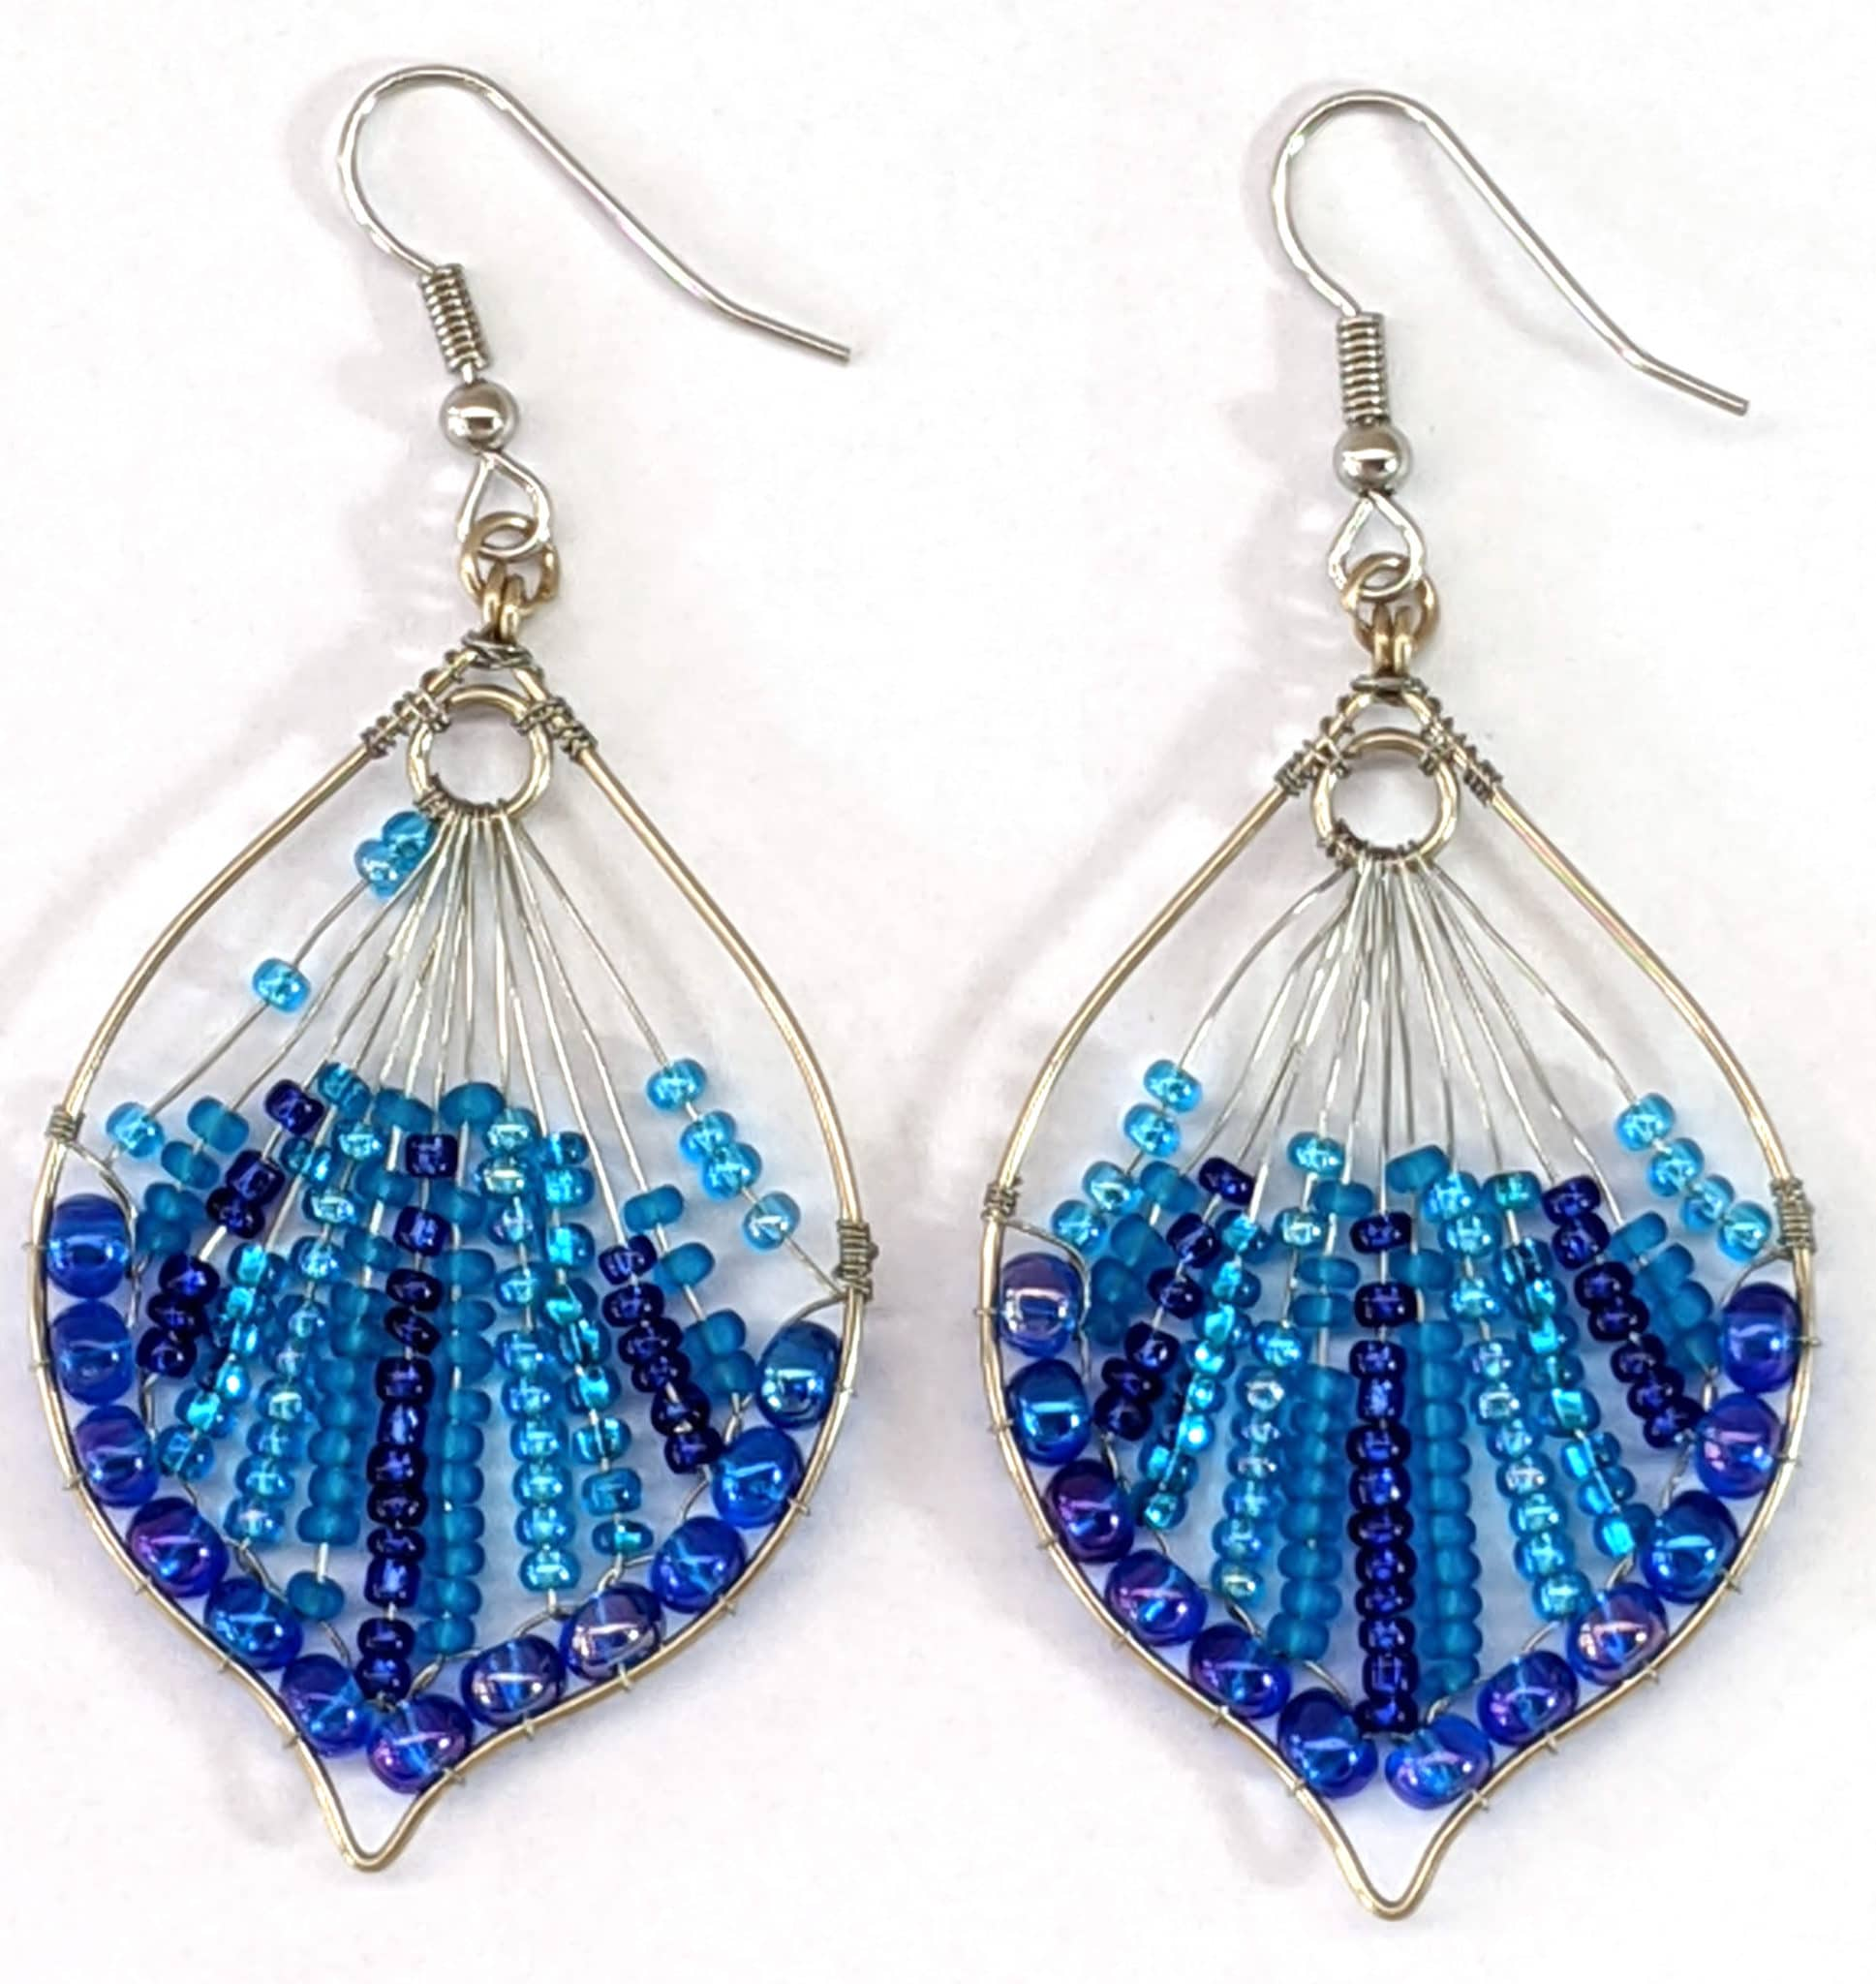 Peacock Tail Beaded Earrings - Blues